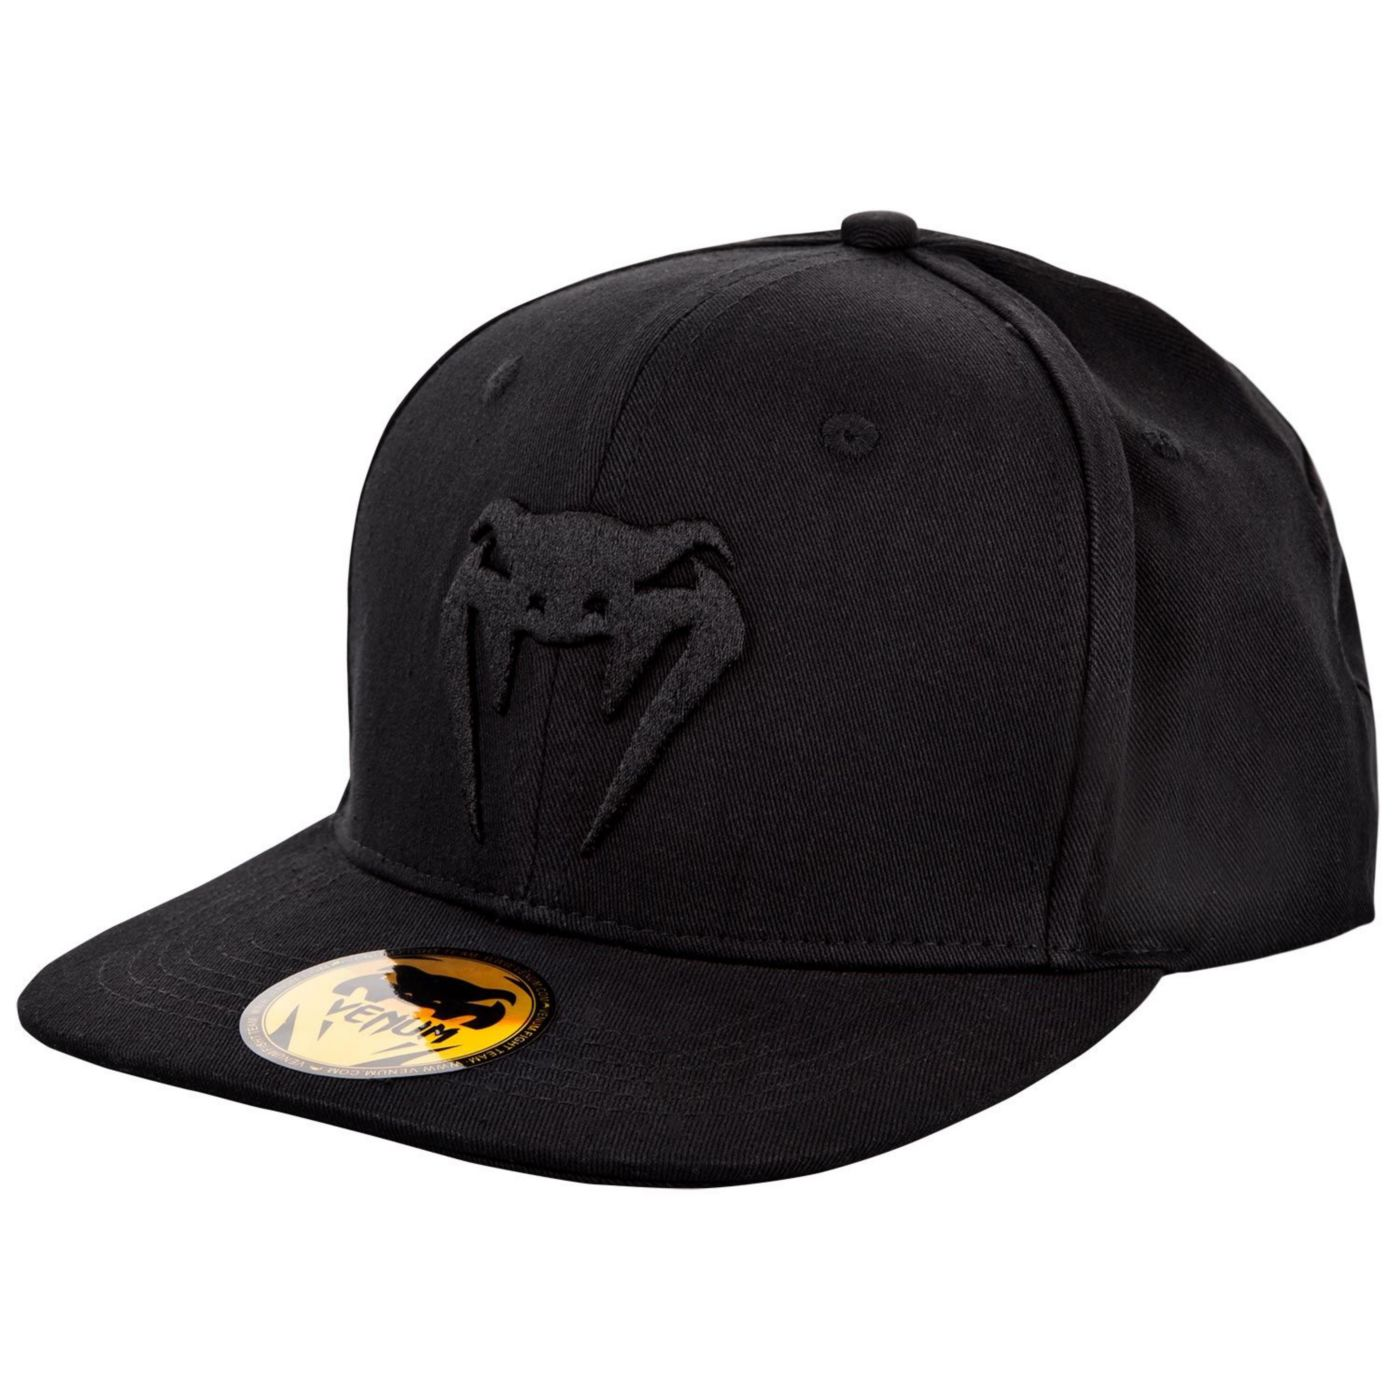 Venum Classic Snapback Hat